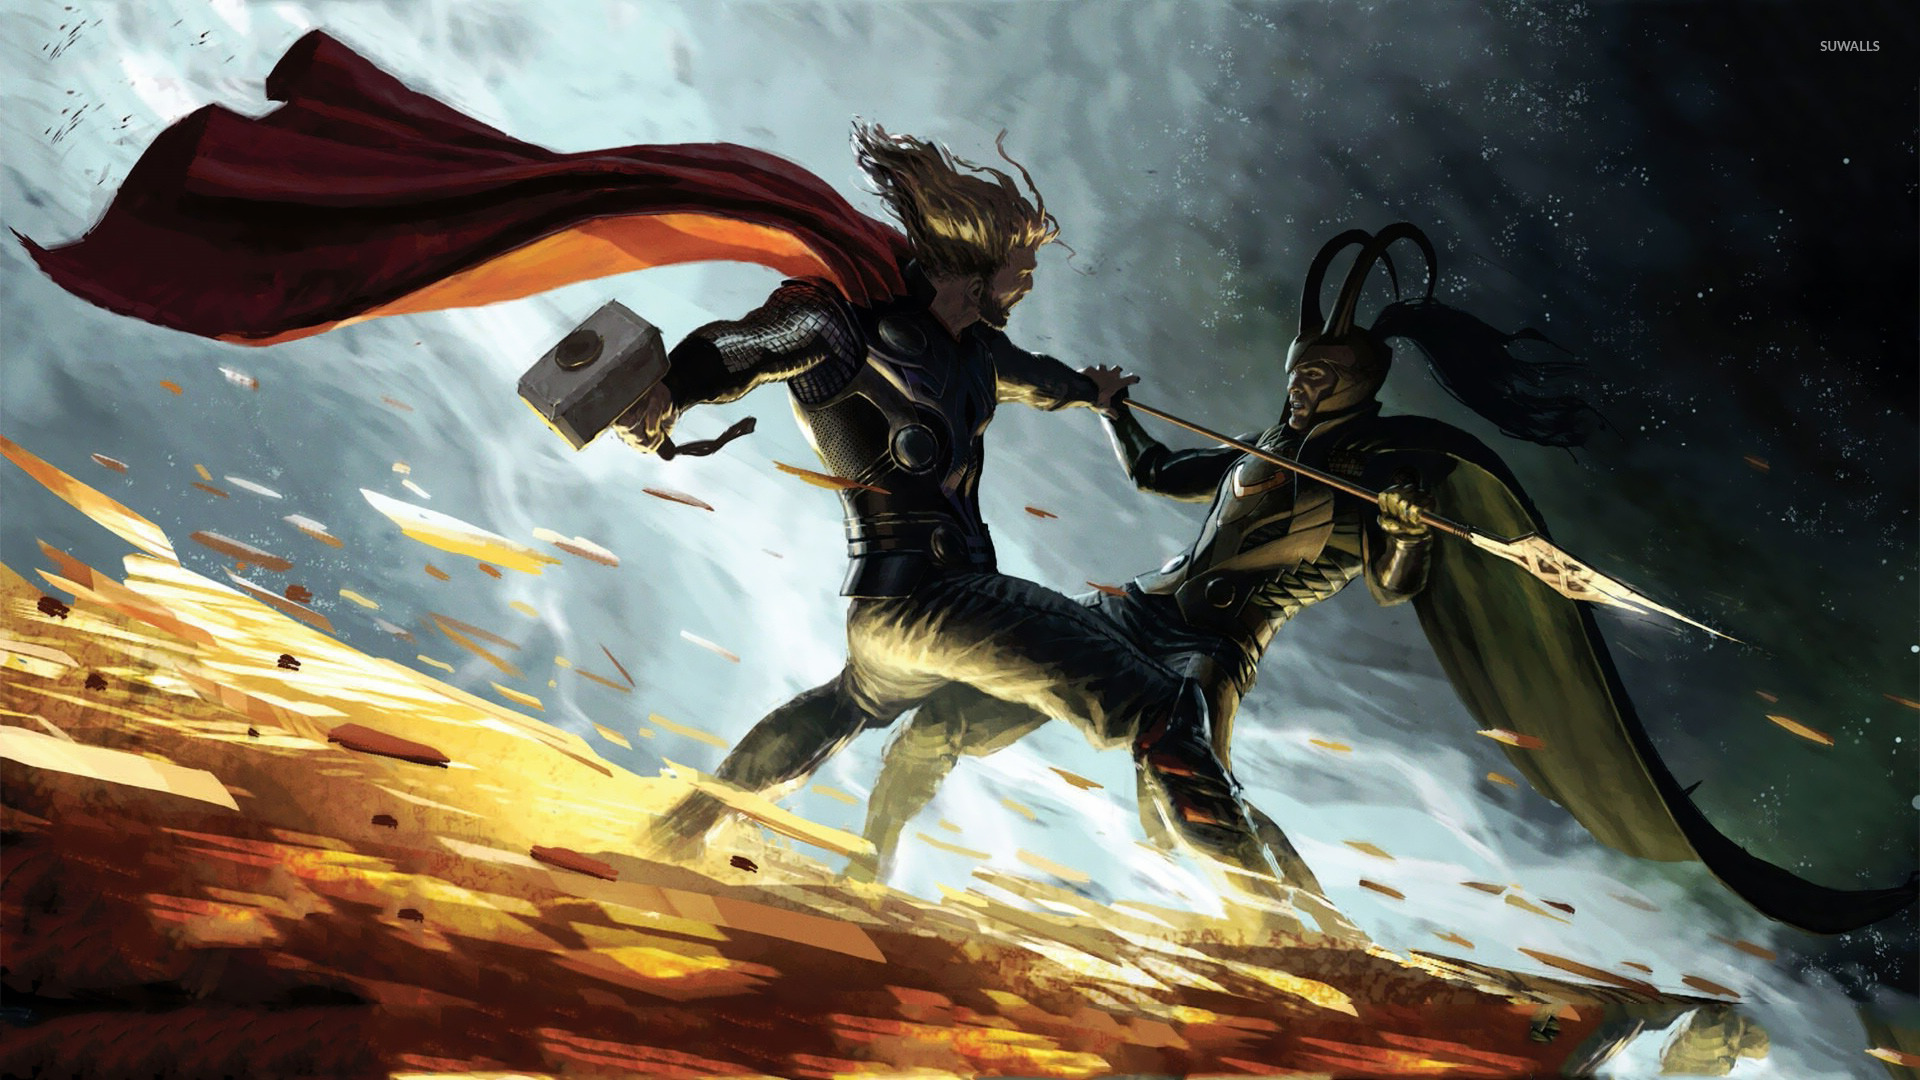 Thor vs Loki wallpaper - Fantasy